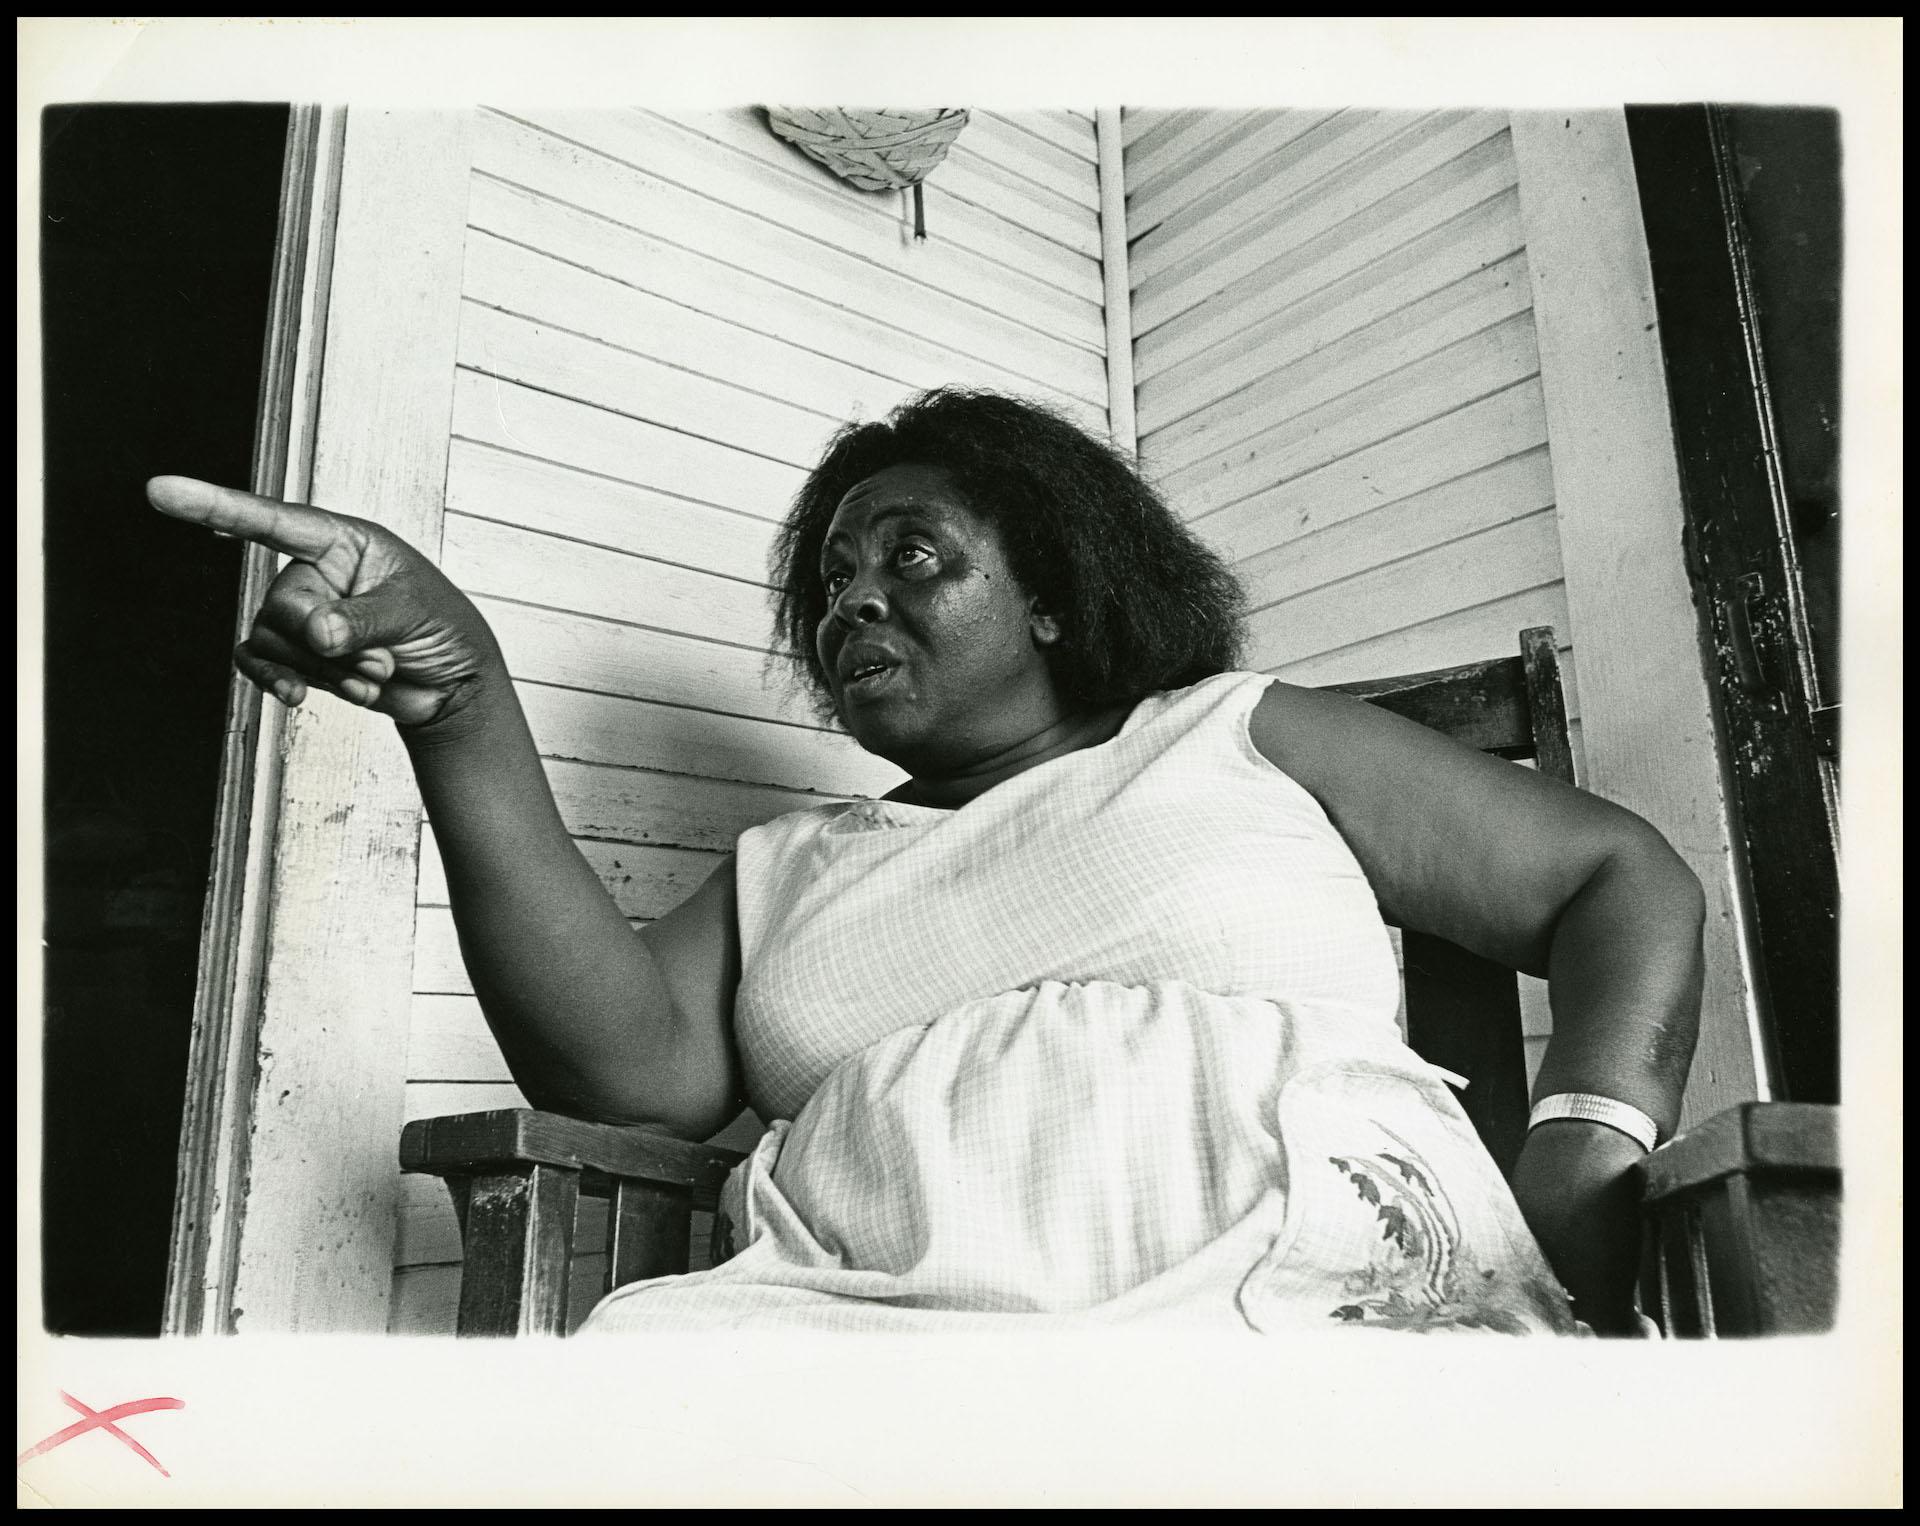 Fannie Lou Hamer, African American History, Black History, Civil Rights, KOLUMN Magazine, KOLUMN, KINDR'D Magazine, KINDR'D, Willoughby Avenue, Wriit,